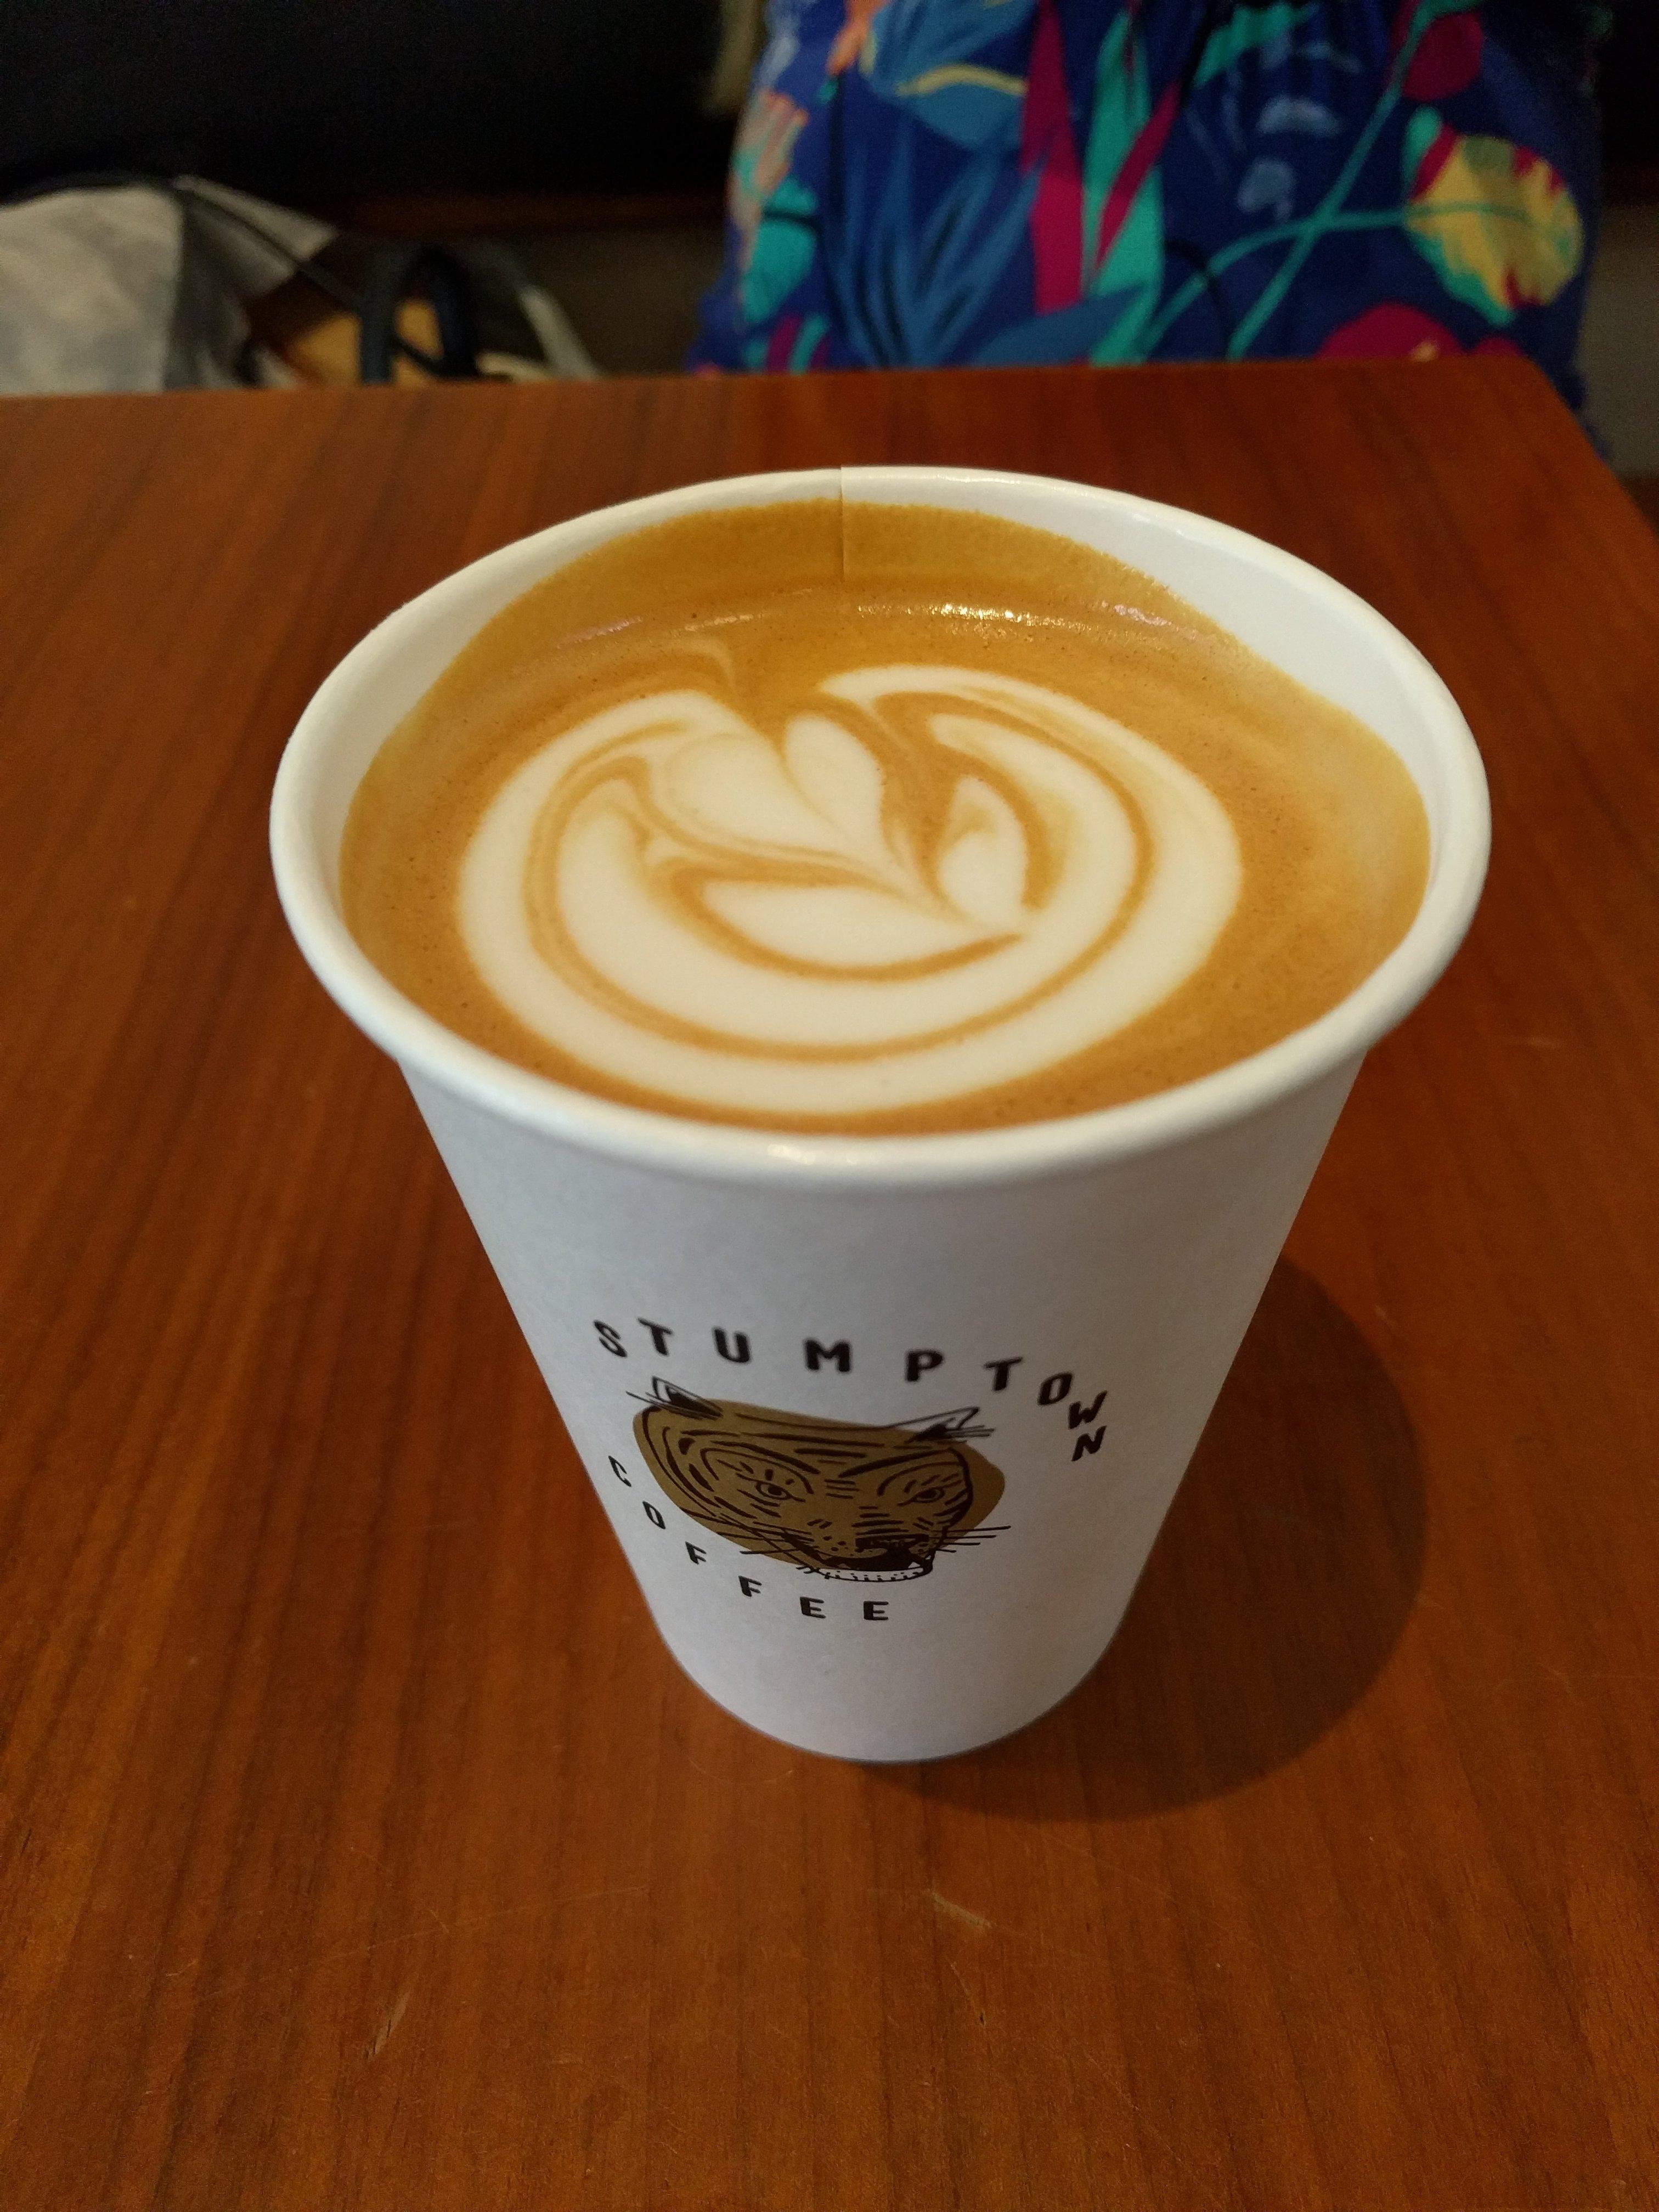 1740 house tripadvisor - Stumptown Coffee Roasters Portland 128 Sw 3rd Ave Menu Prices Restaurant Reviews Tripadvisor